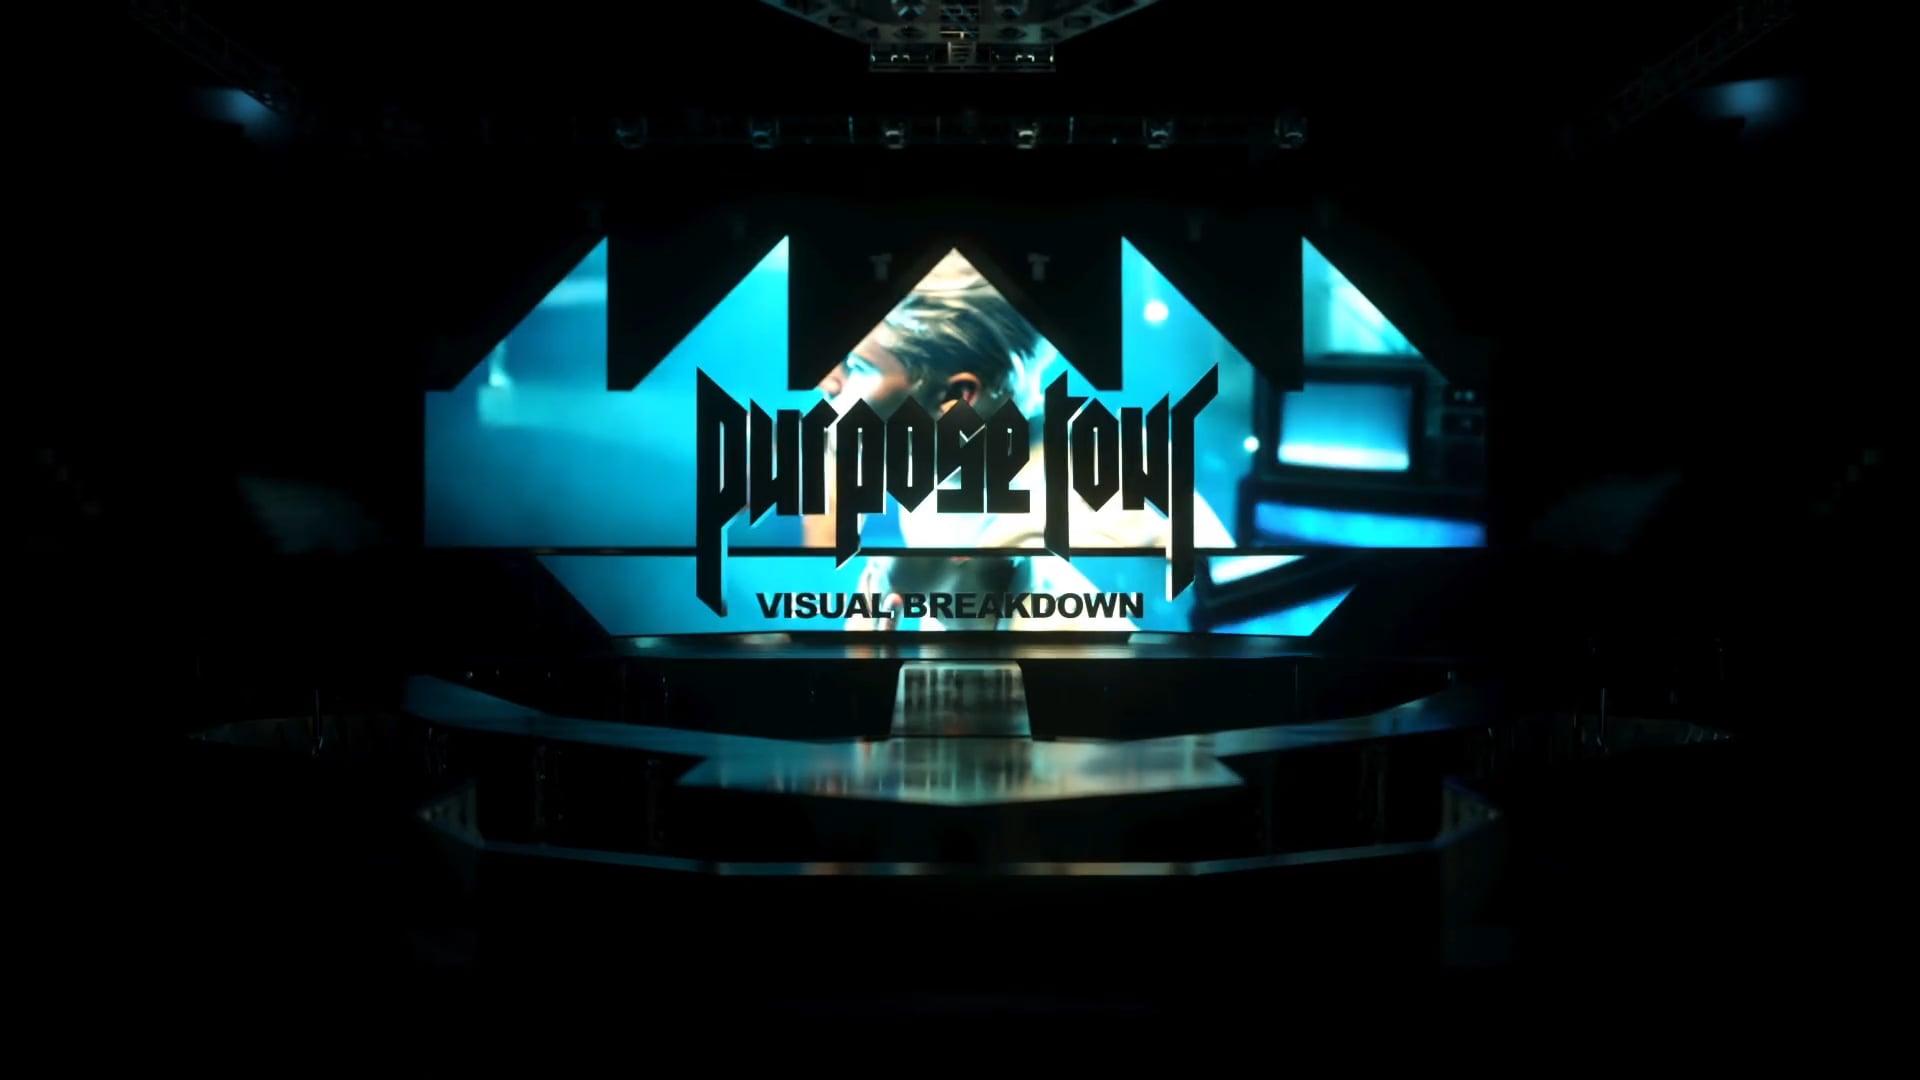 Justin Bieber Purpose Tour Visual Breakdown